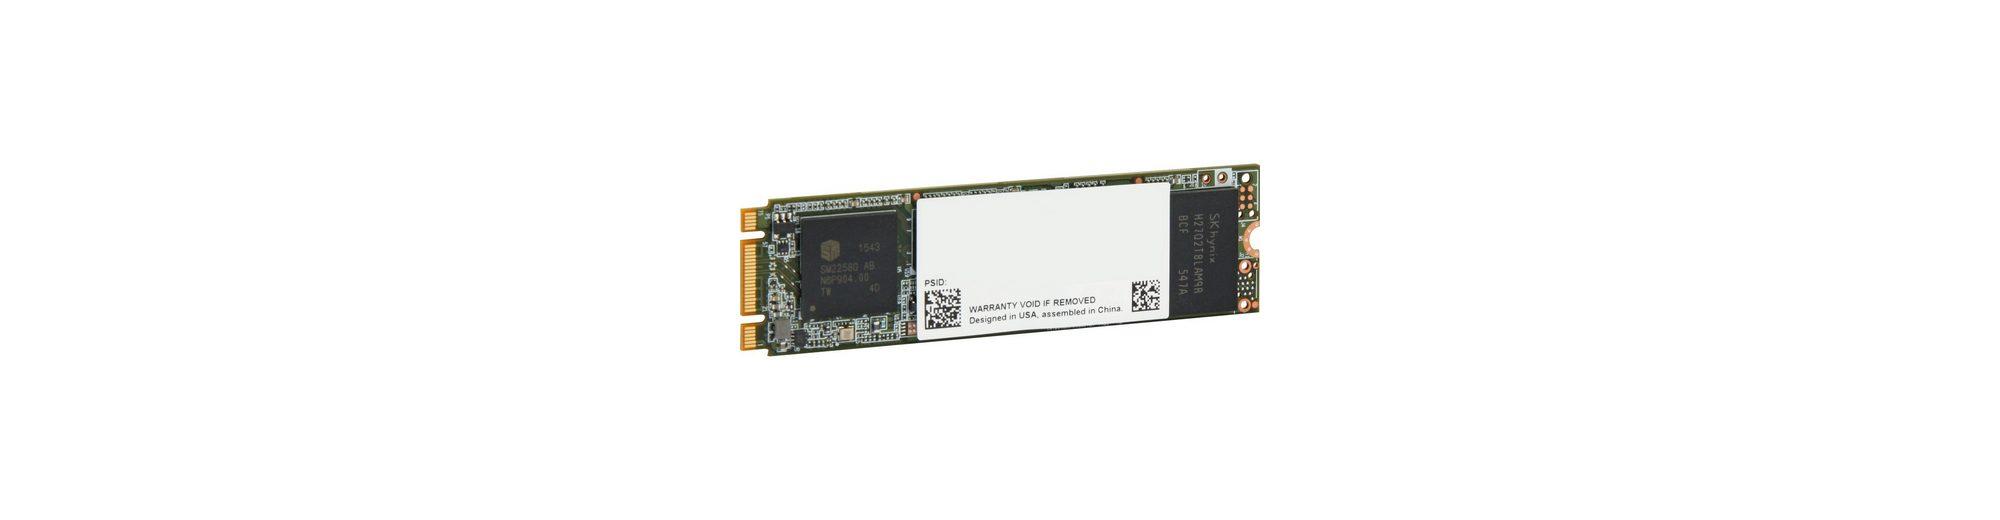 Intel® Solid State Drive »120 GB«